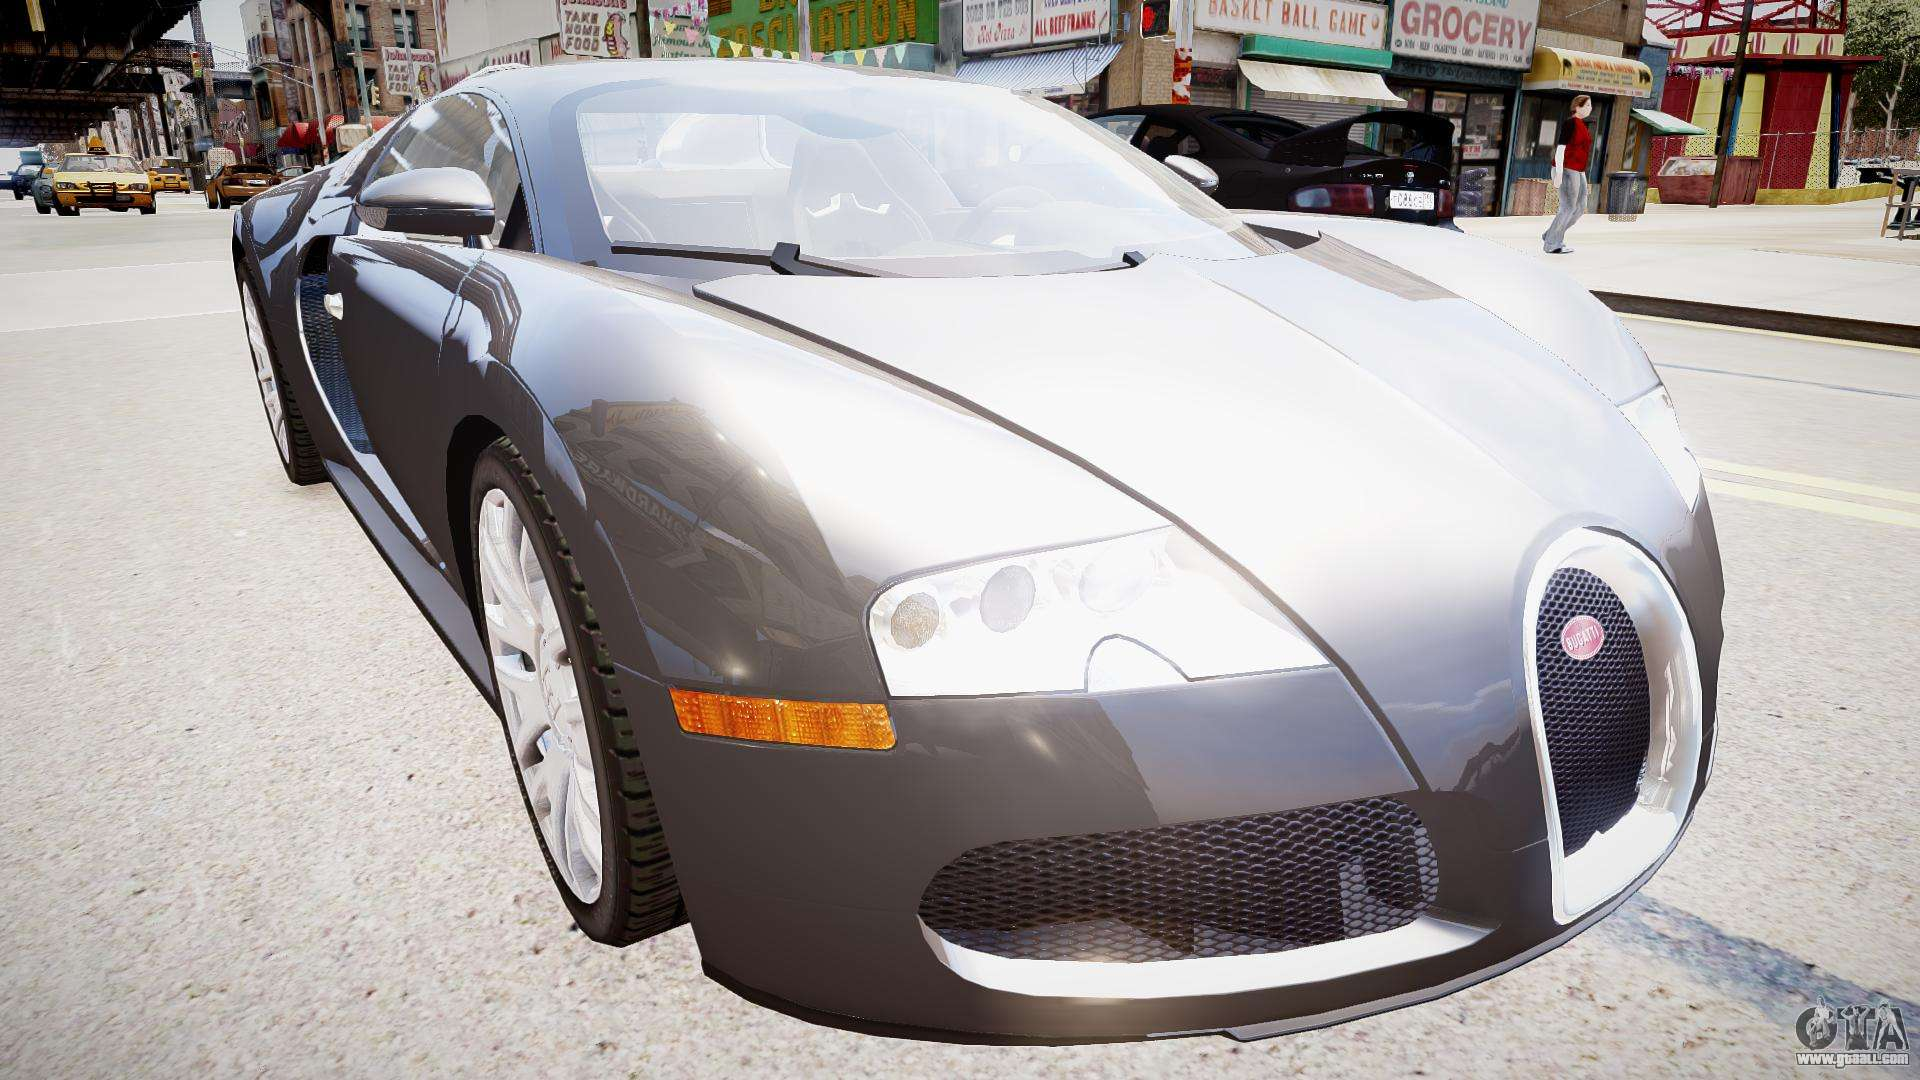 372627-GTAIV-2016-12-24-18-26-38-11 Wonderful Bugatti Veyron Xbox 360 Games Cars Trend